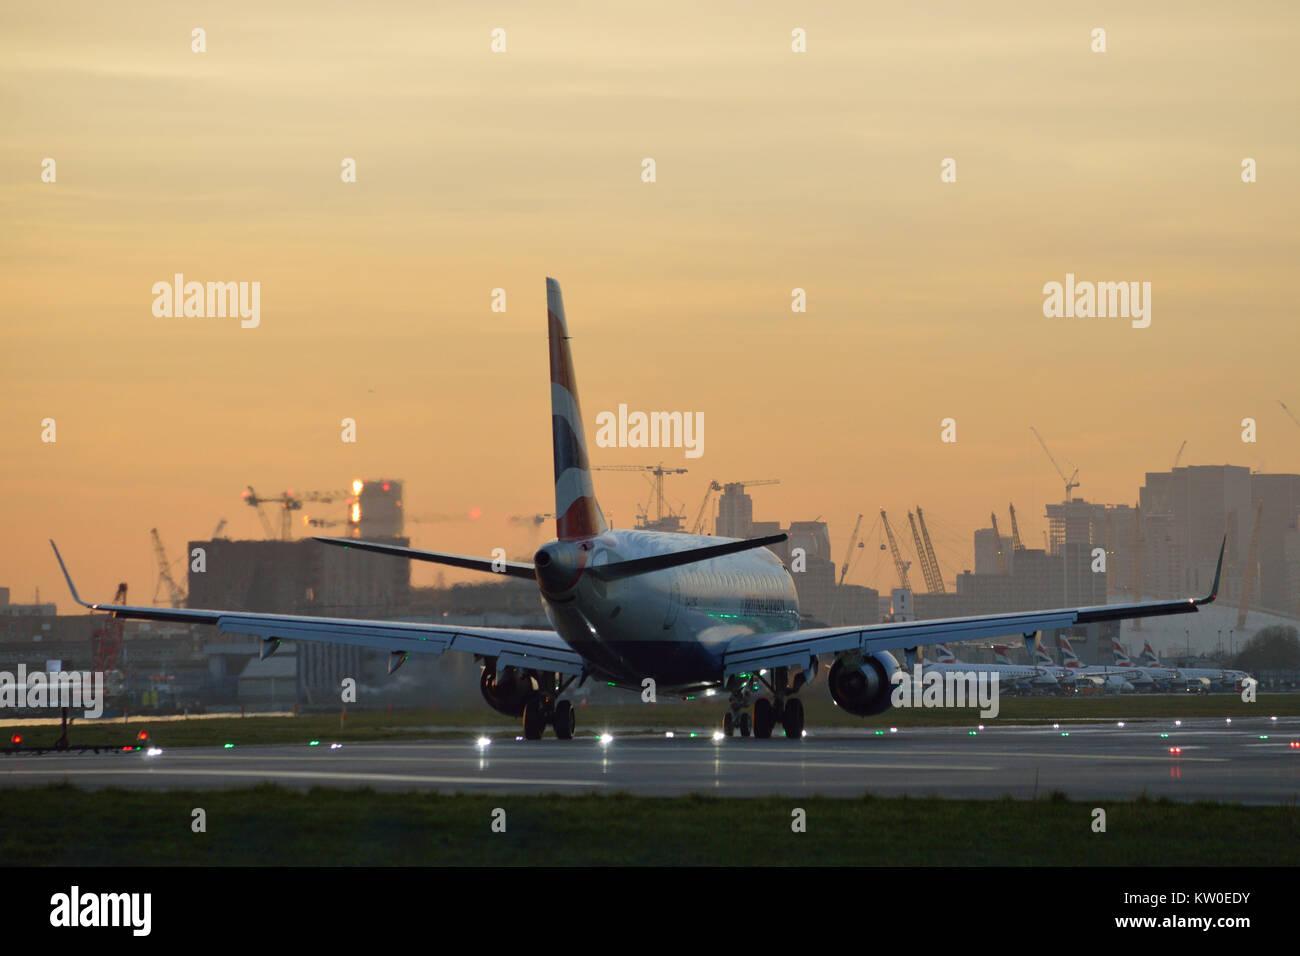 British Airways BA CityFlyer Embraer taxing at London City Airport at dusk - Stock Image